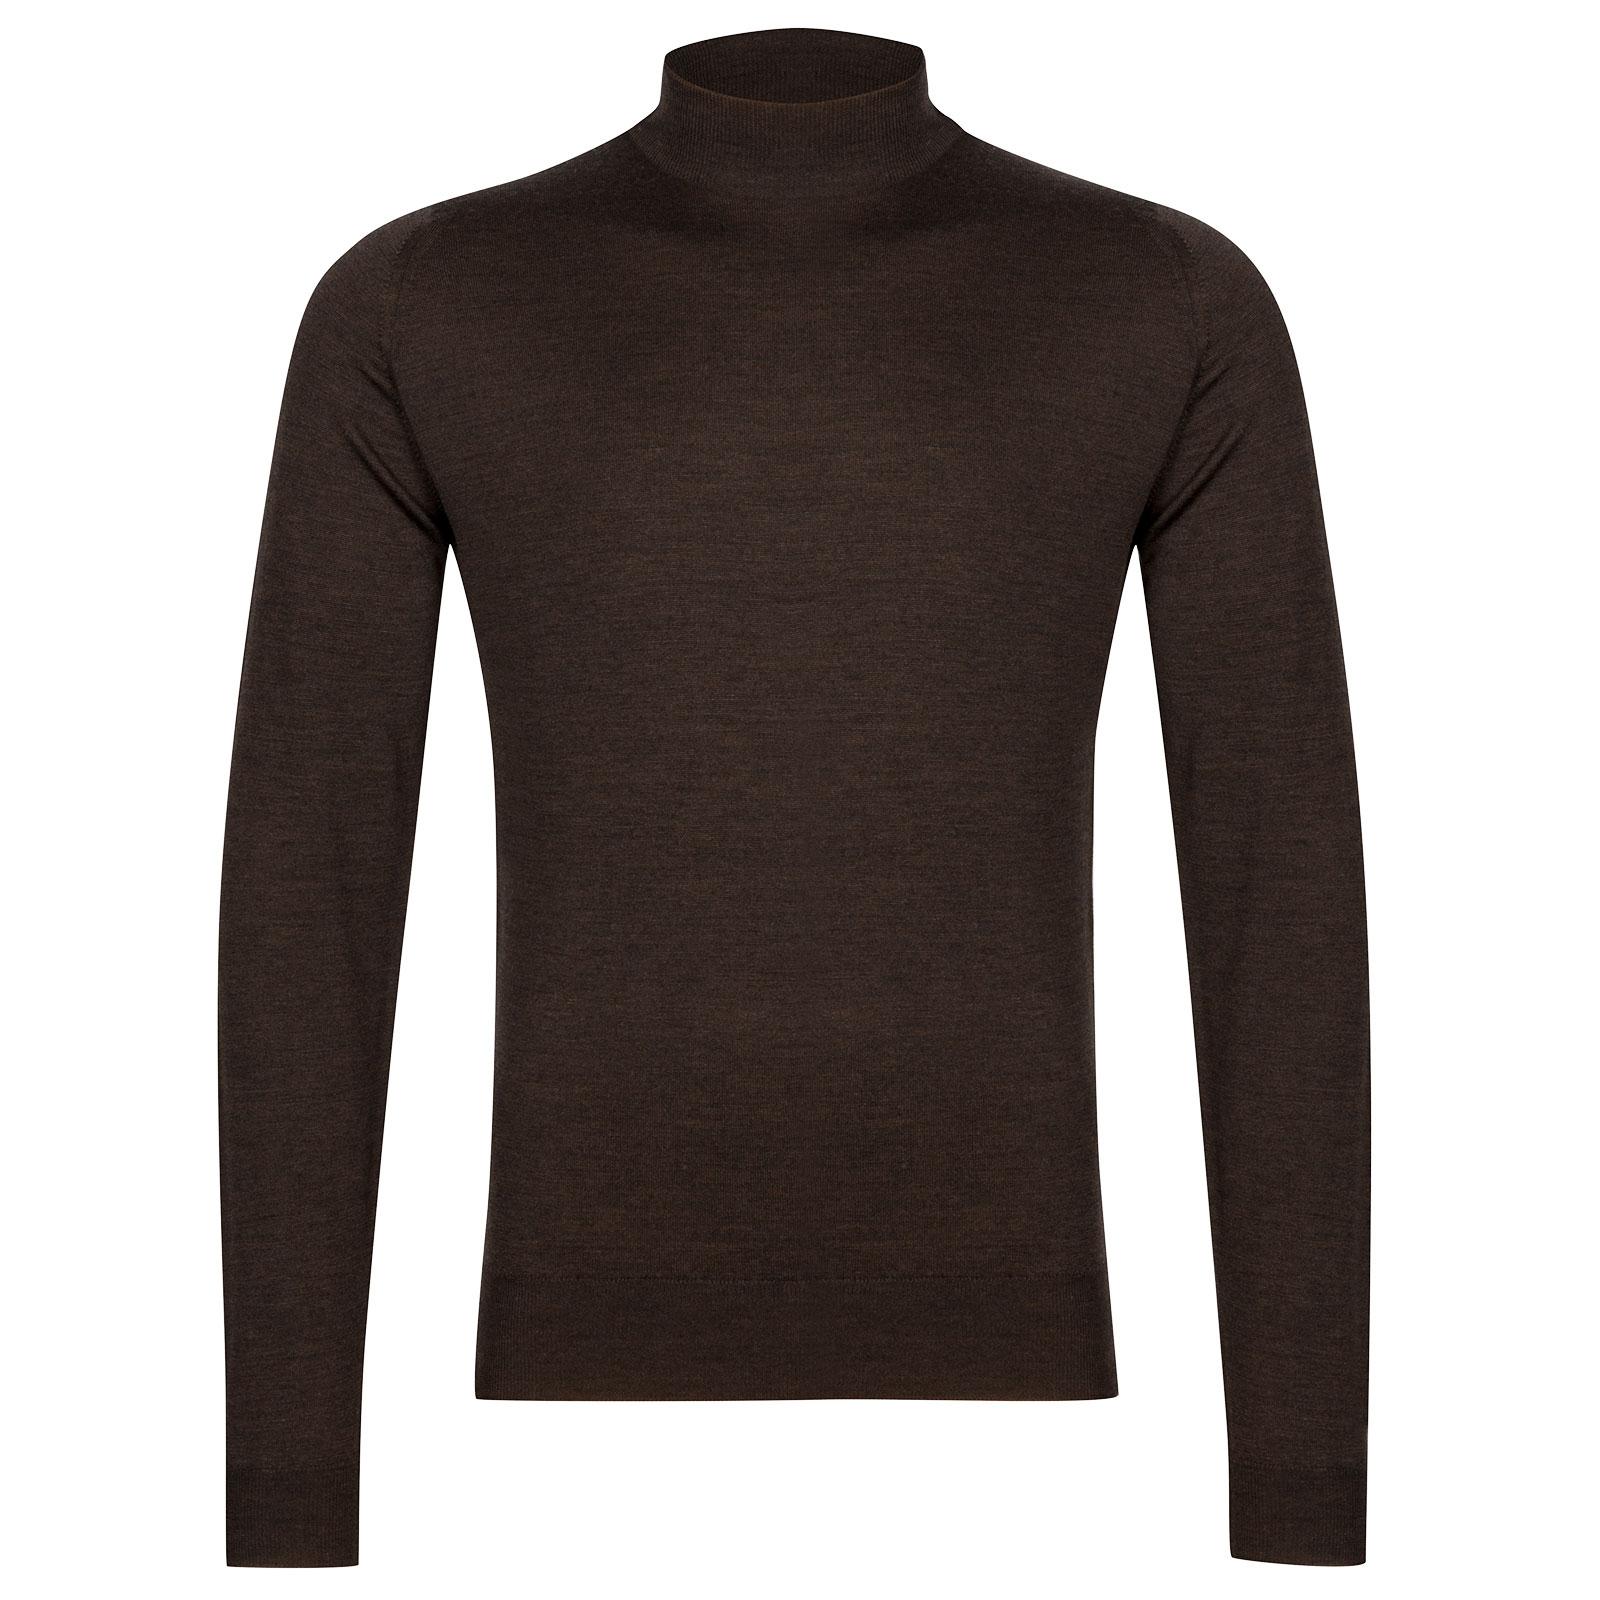 John Smedley Harcourt Merino Wool Pullover in Chestnut-L